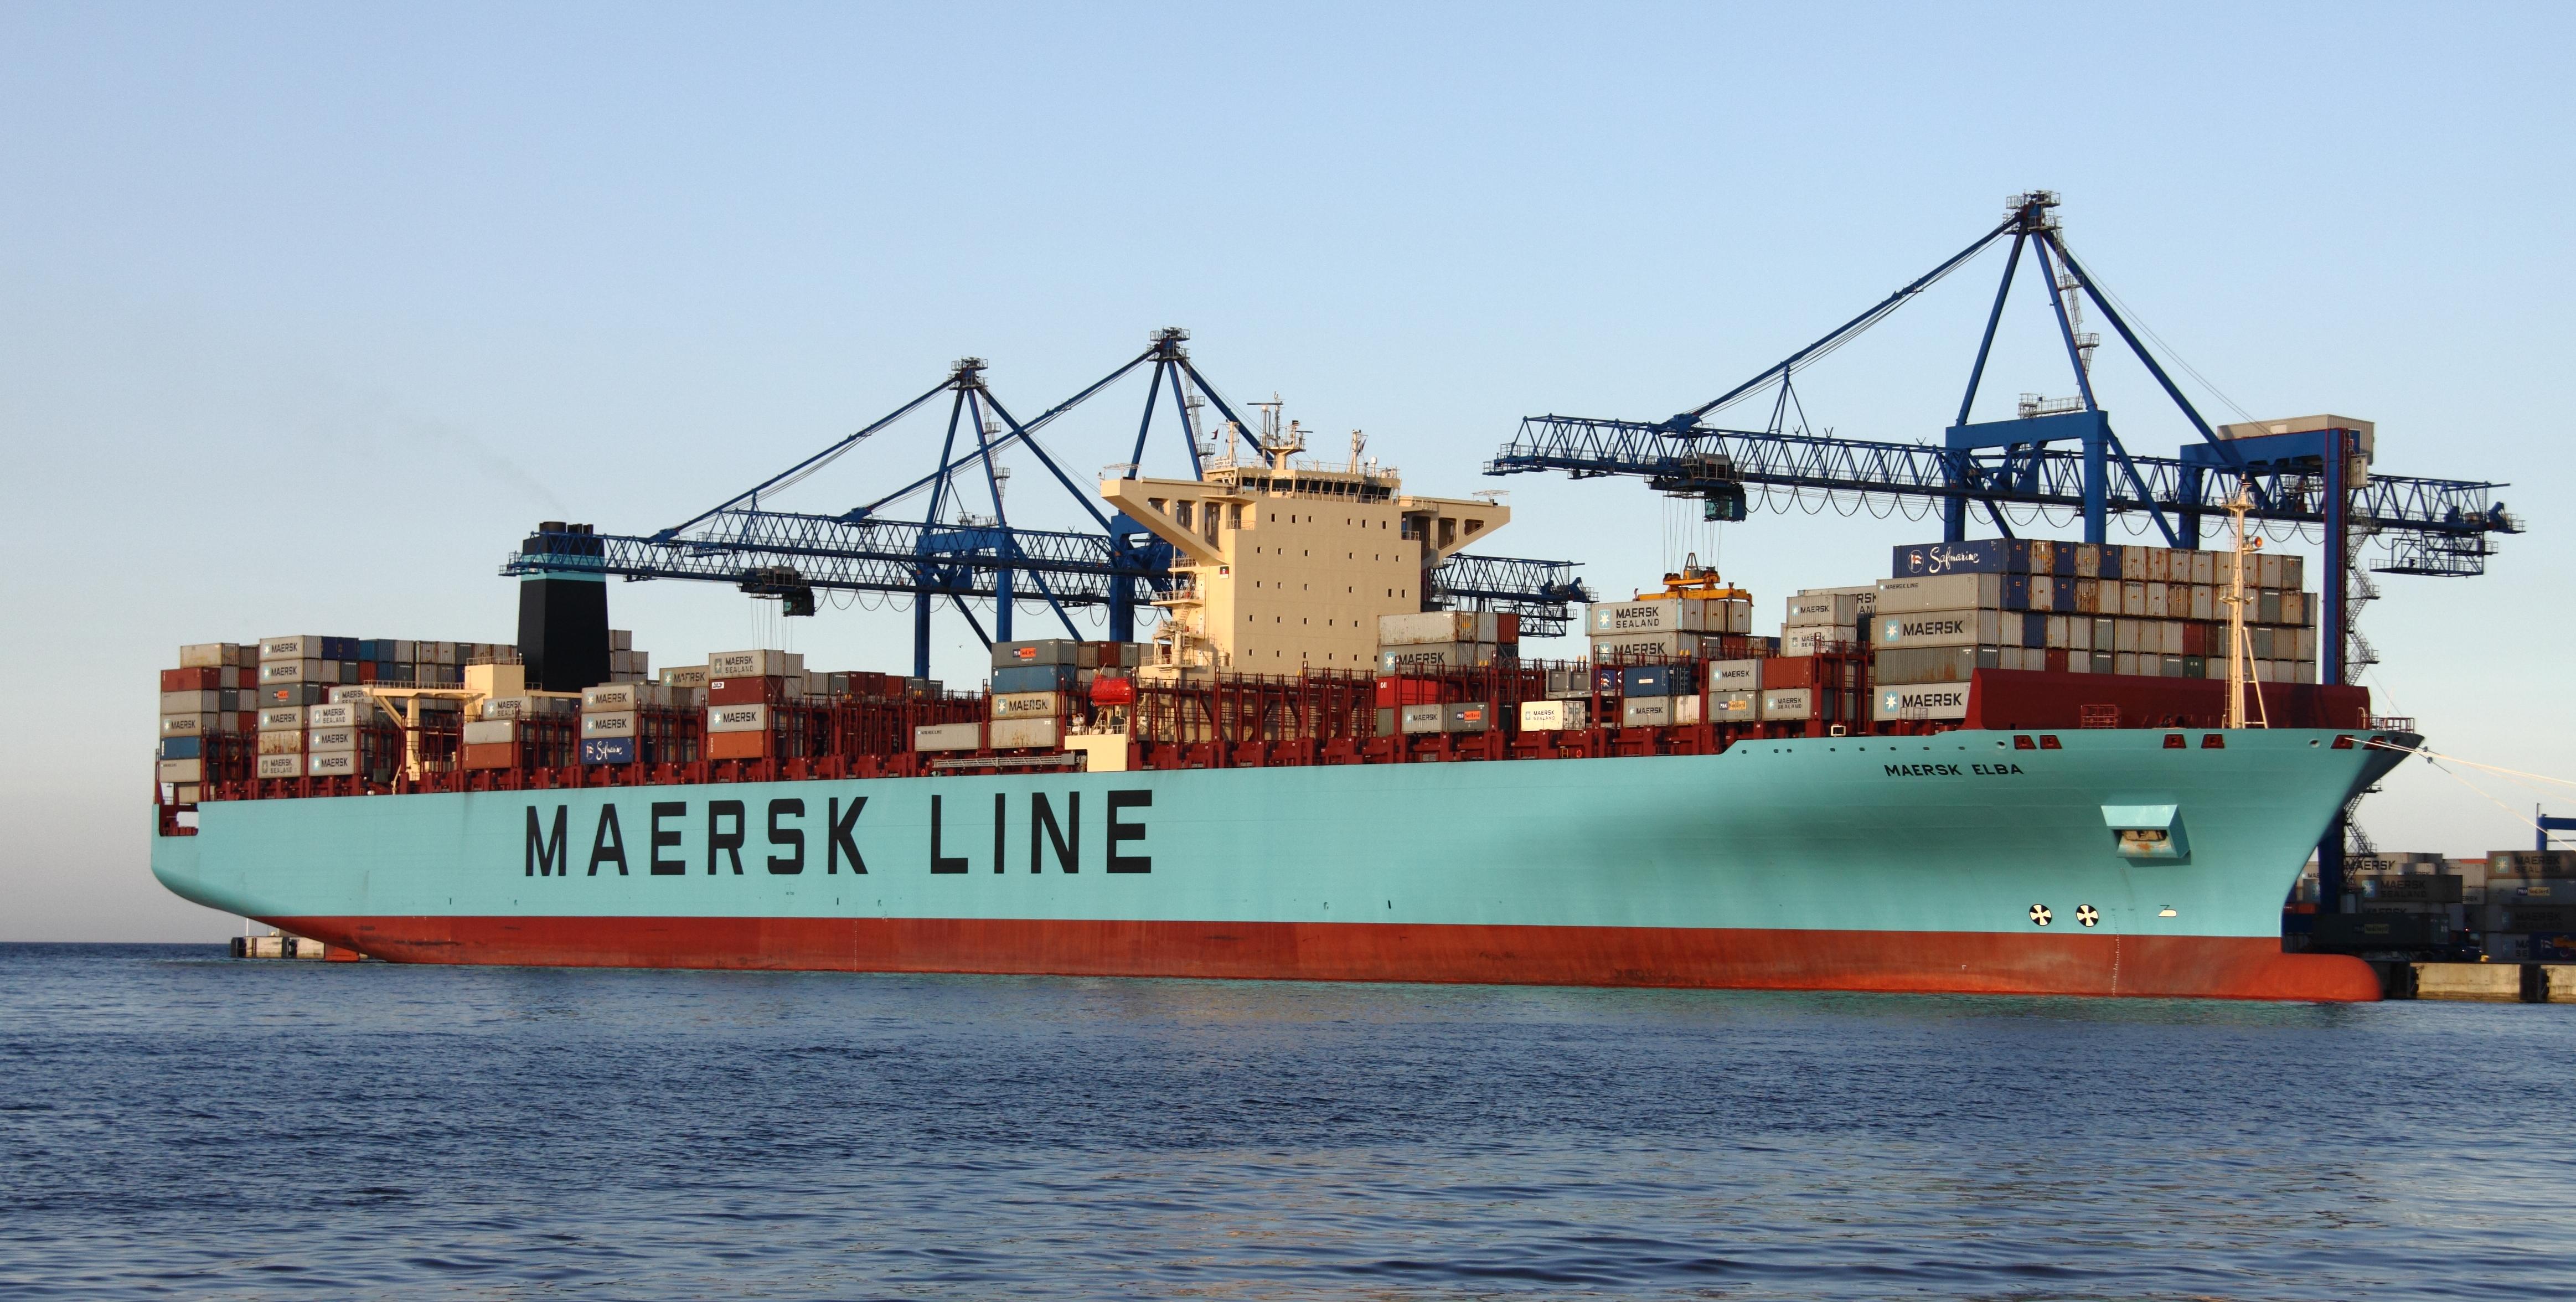 http://upload.wikimedia.org/wikipedia/commons/7/7b/Maersk_Elba.JPG